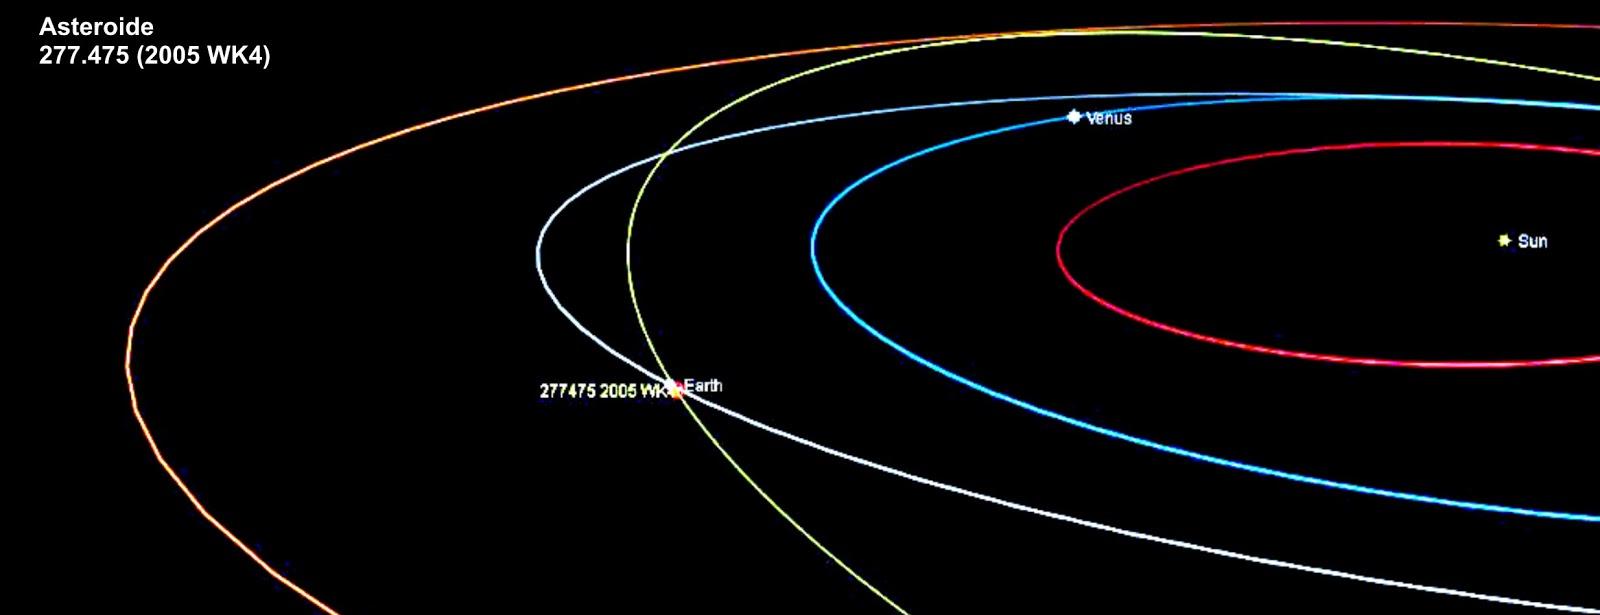 bennu asteroid orbit - photo #4